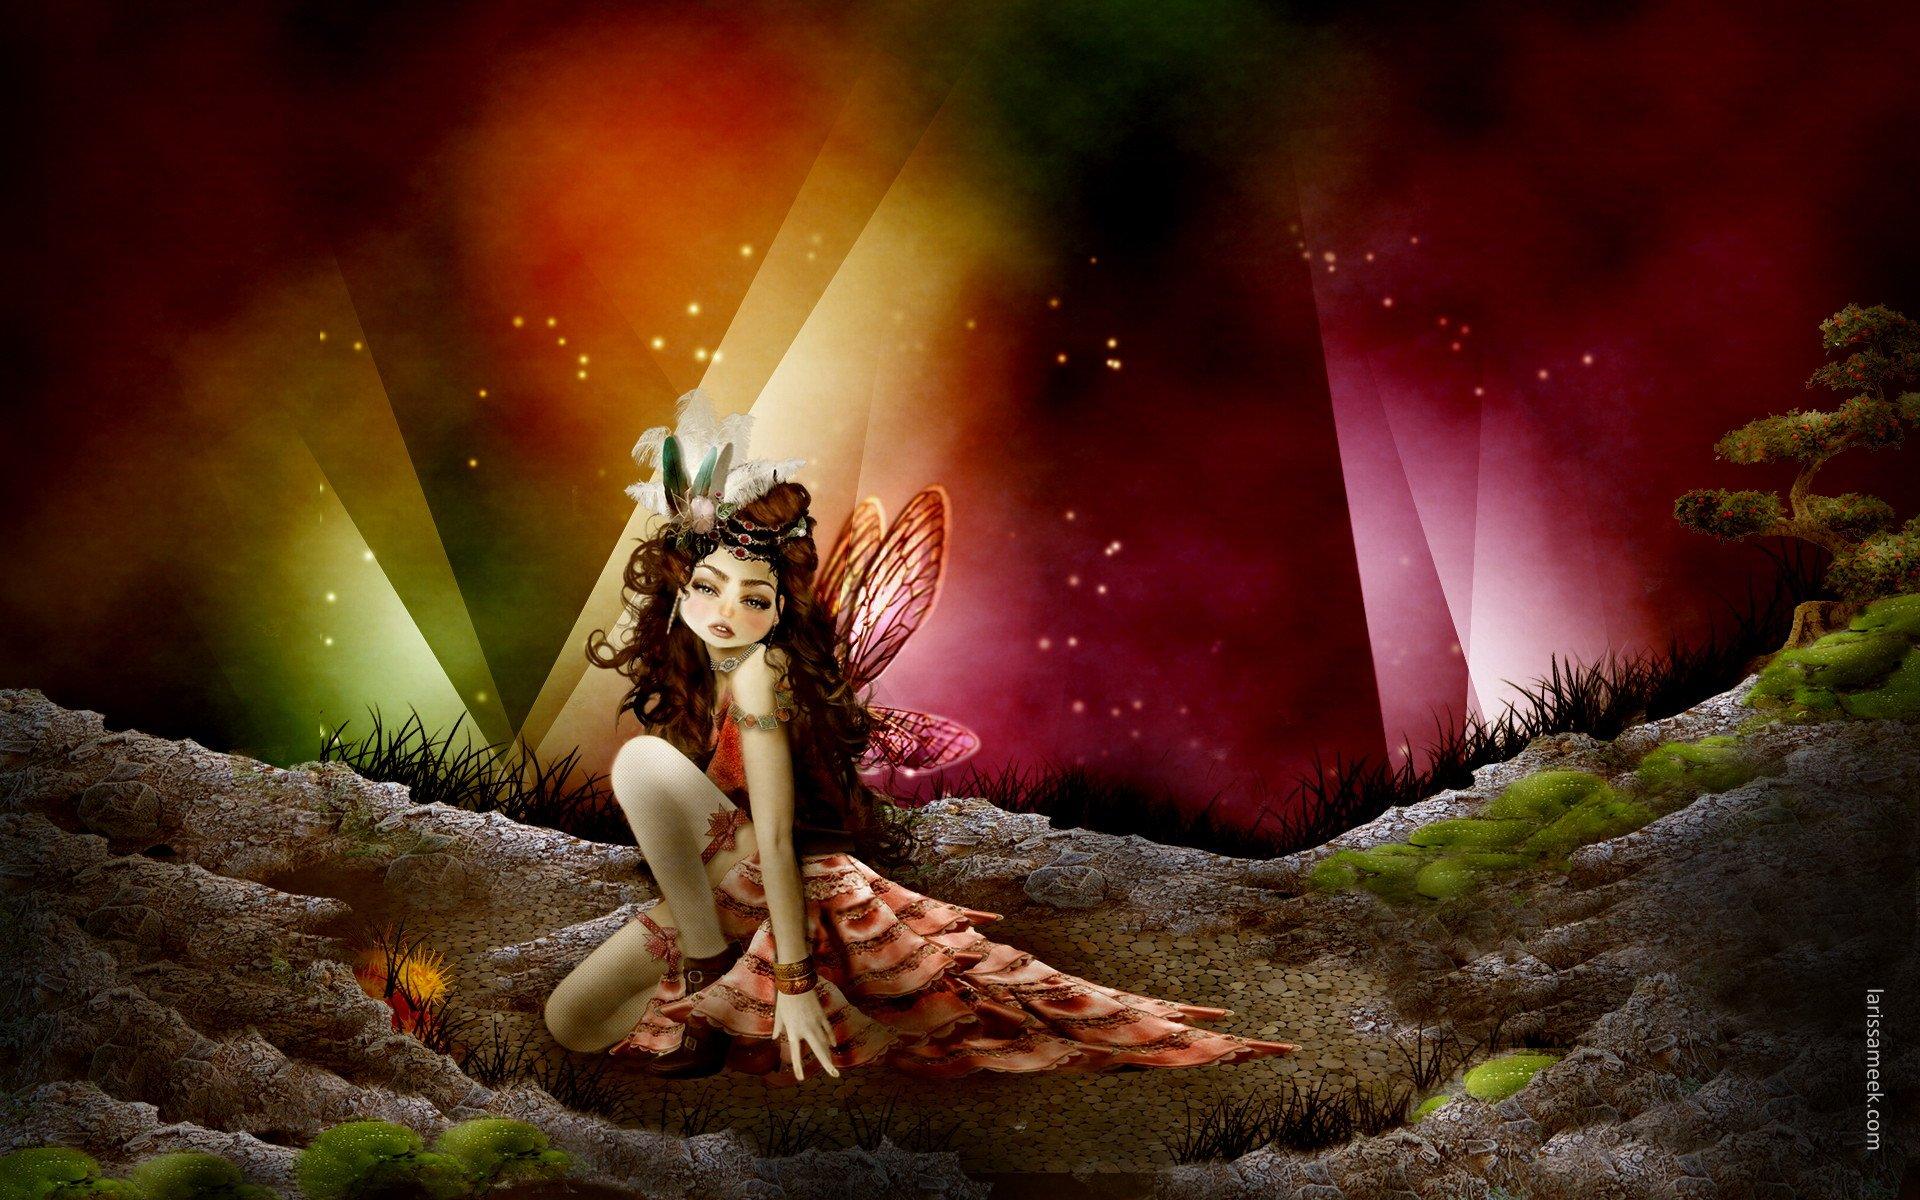 desktop wallpaper fairies - photo #37